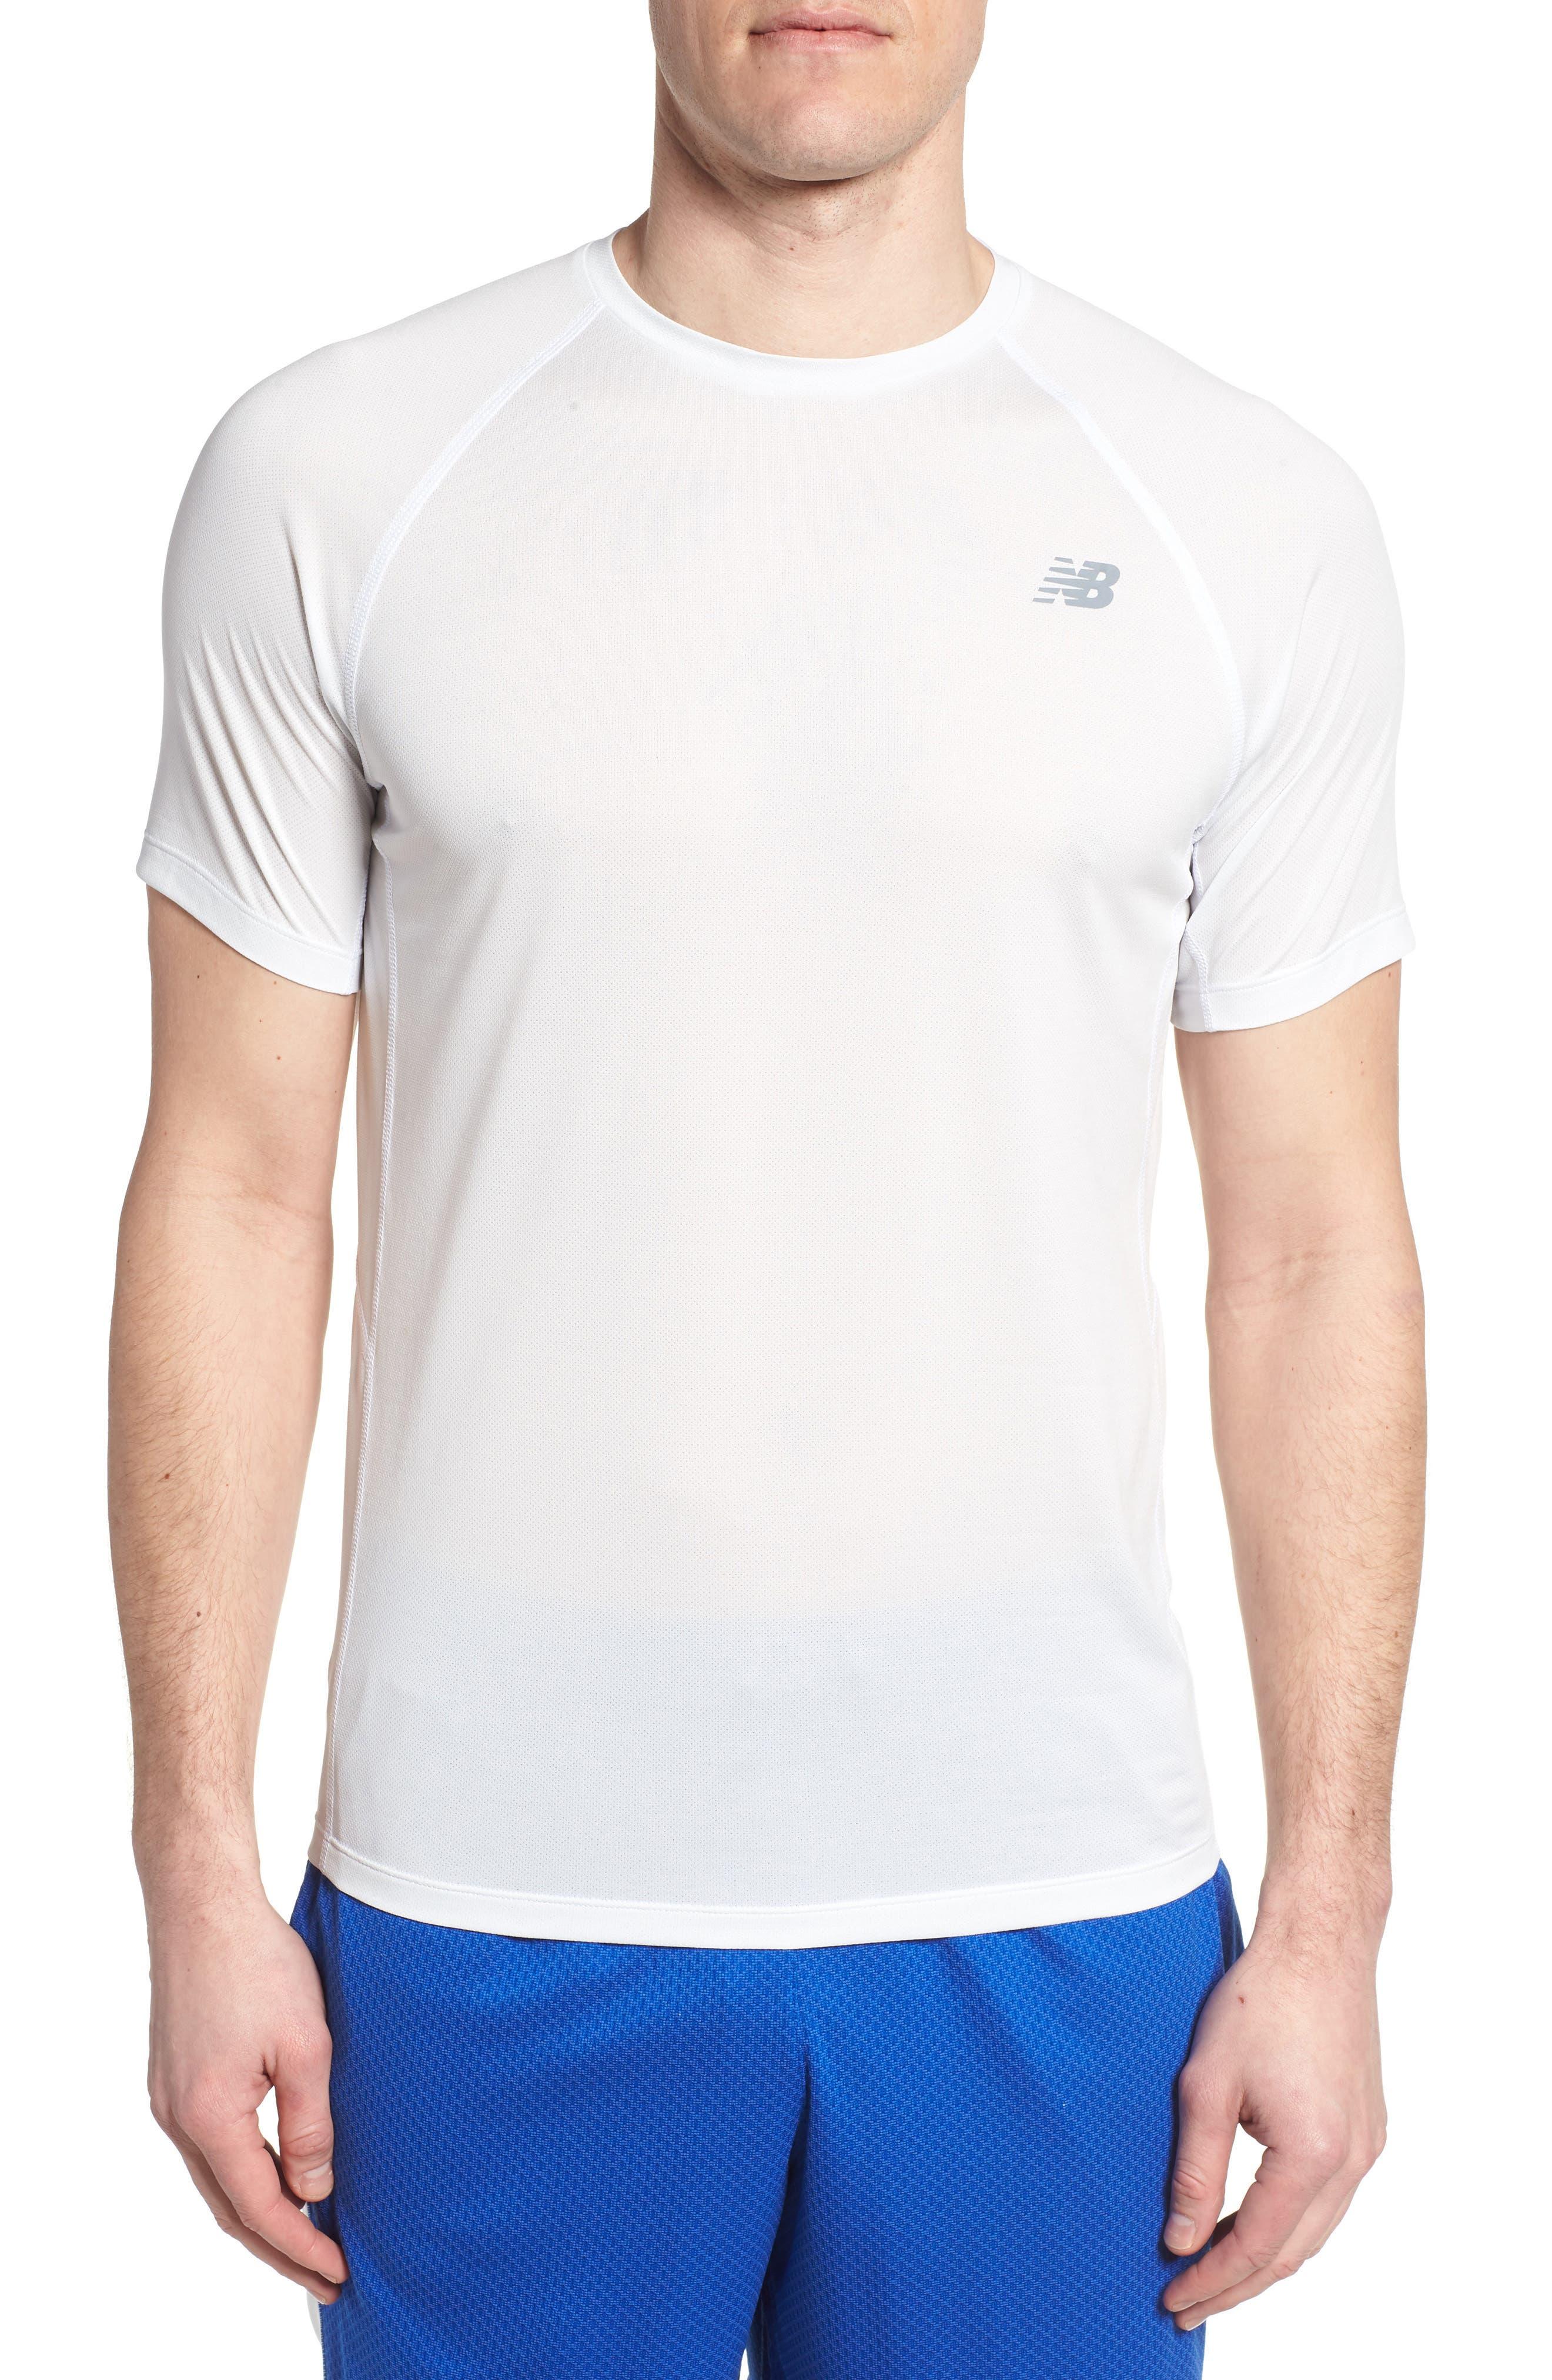 Tenacity Crewneck T-Shirt,                             Main thumbnail 1, color,                             WHITE